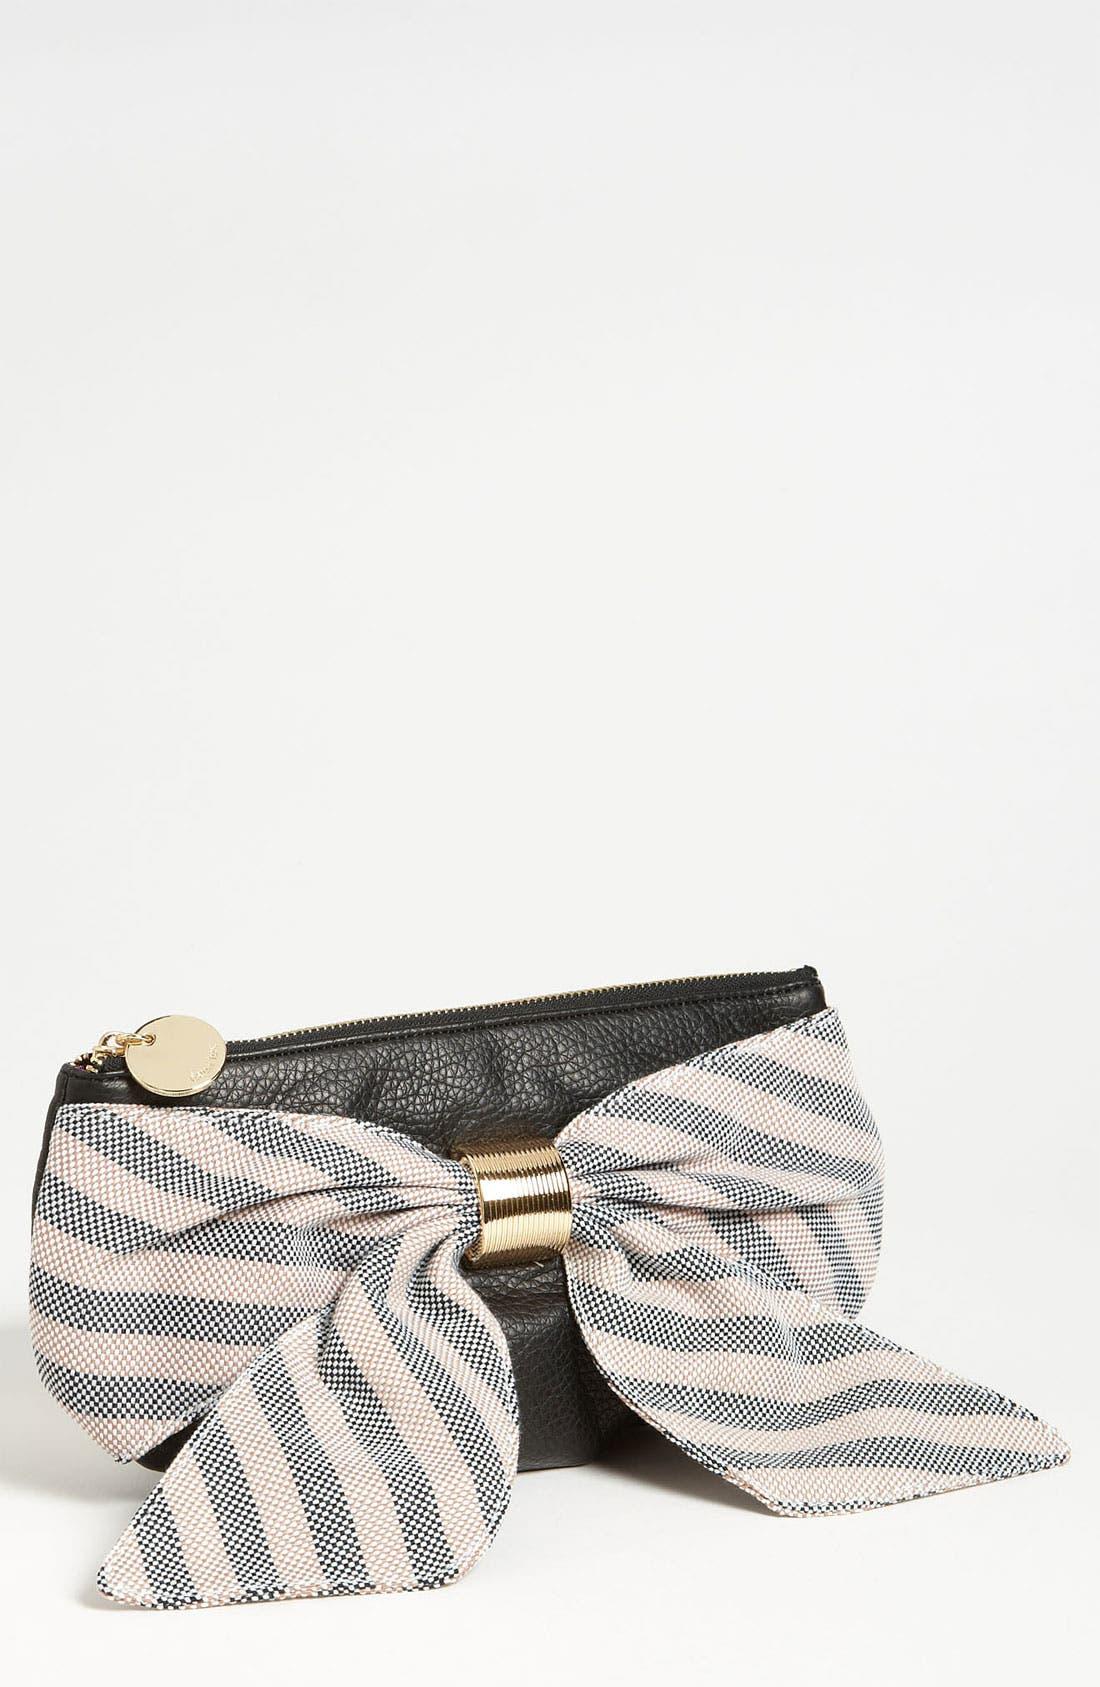 DEUX LUX 'Heidi Girl' Stripe Box Clutch, Main, color, 001